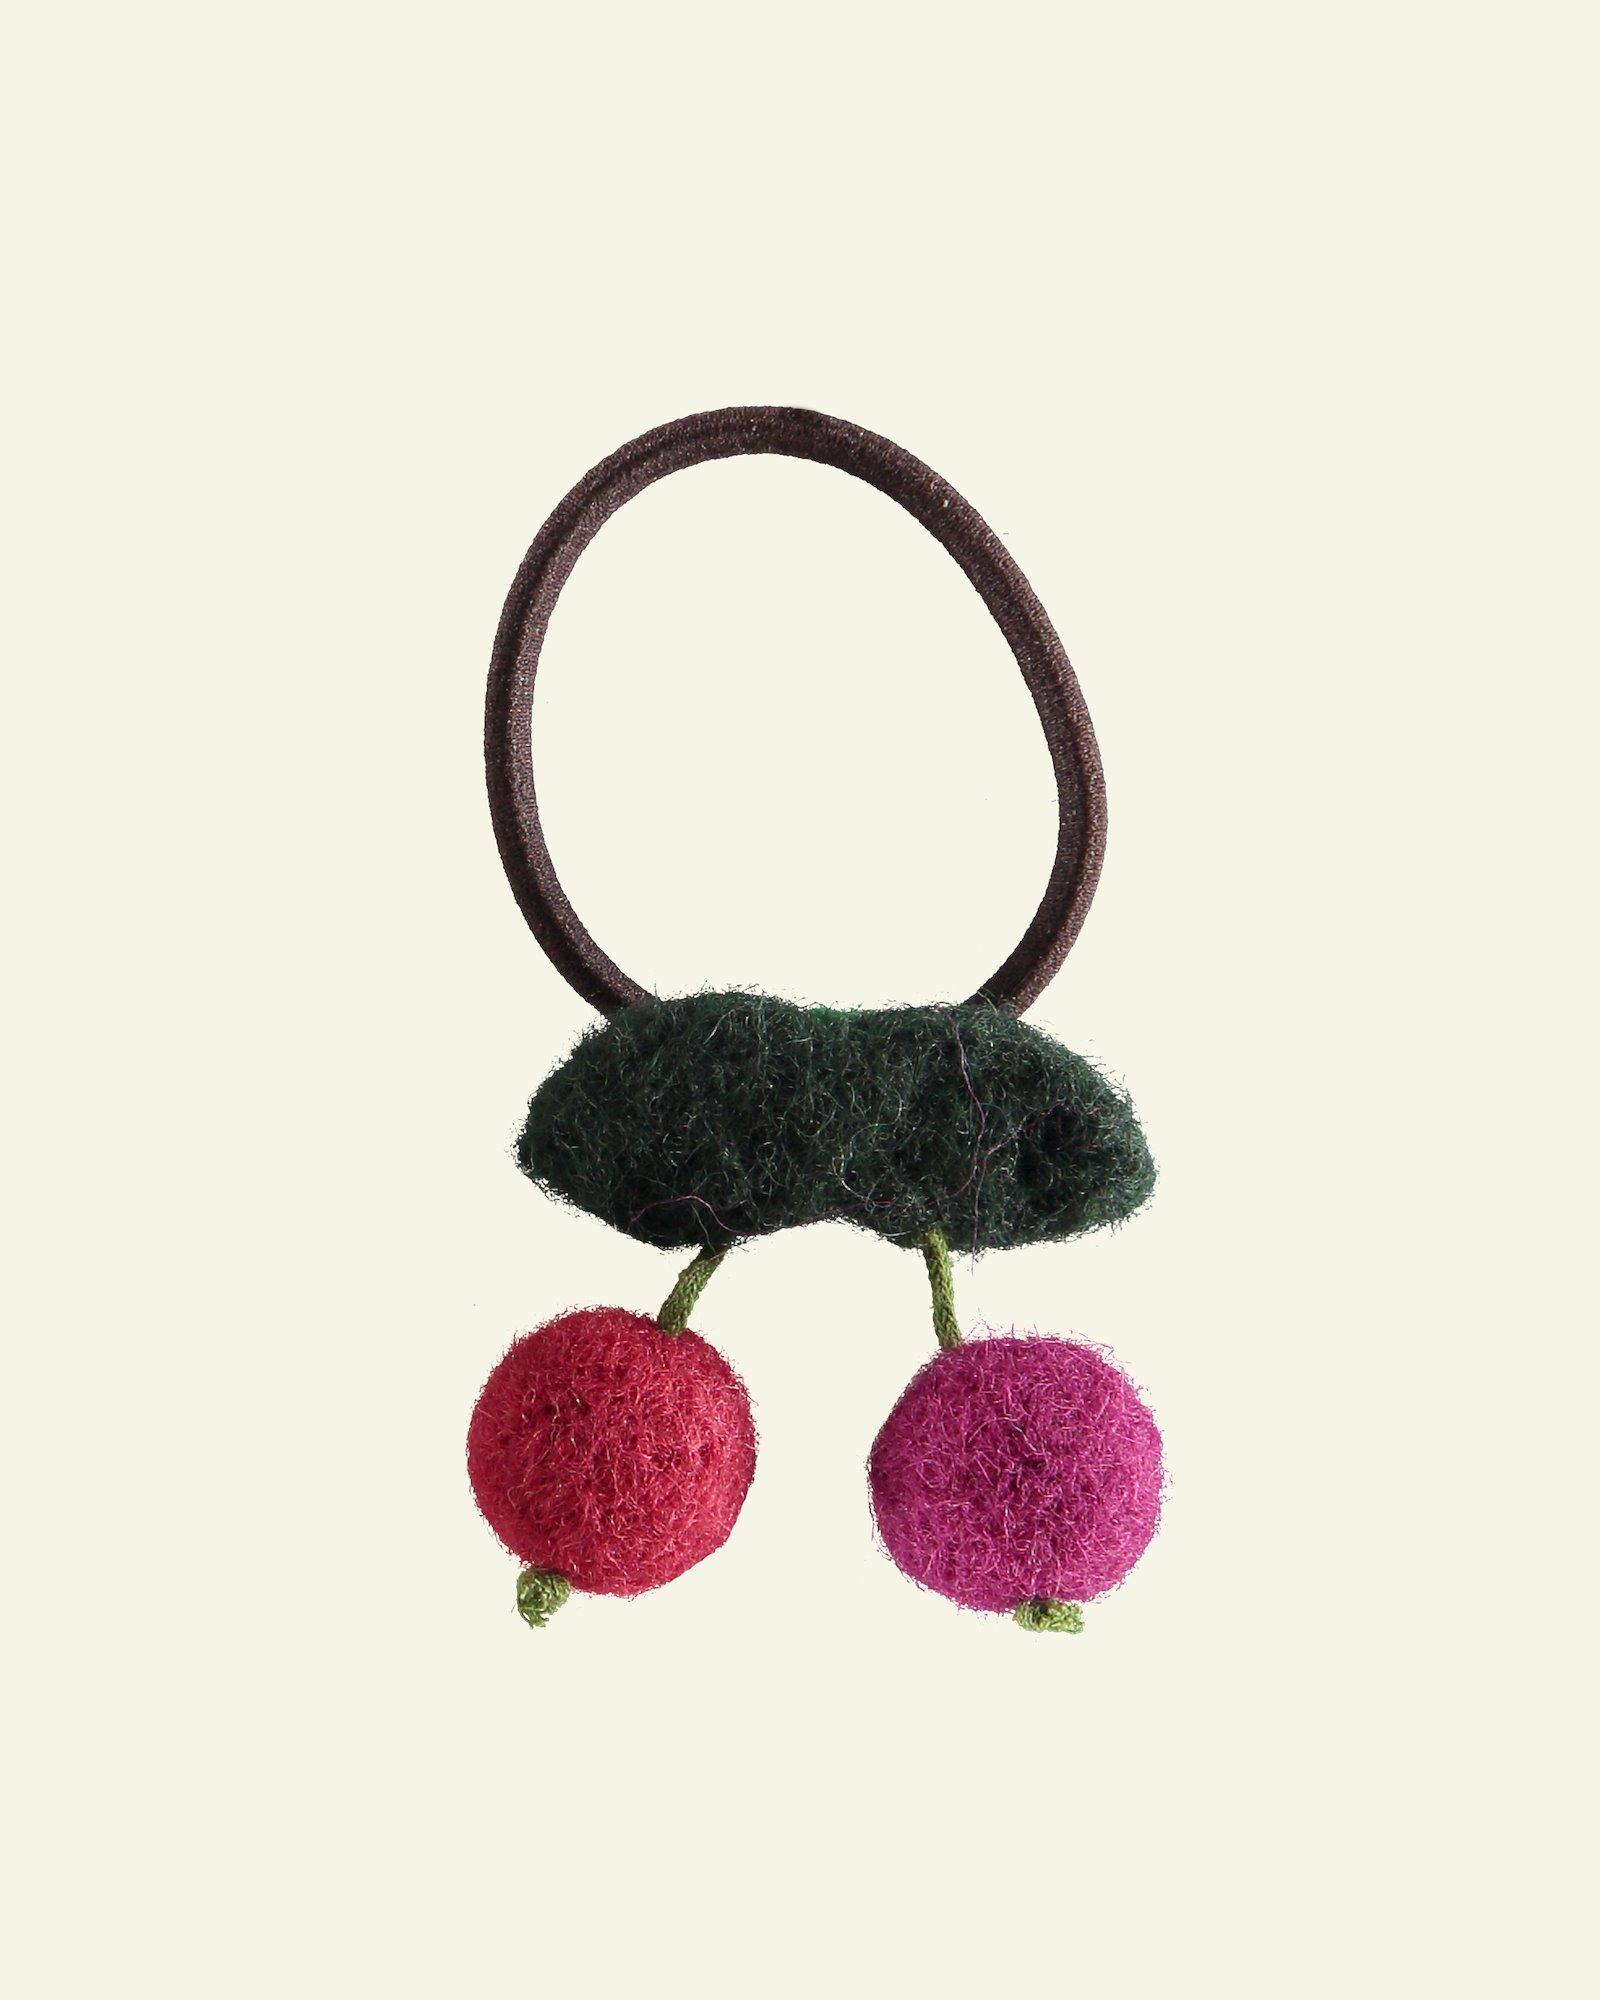 Kit felt hair accessories cherry 9cm 1pc